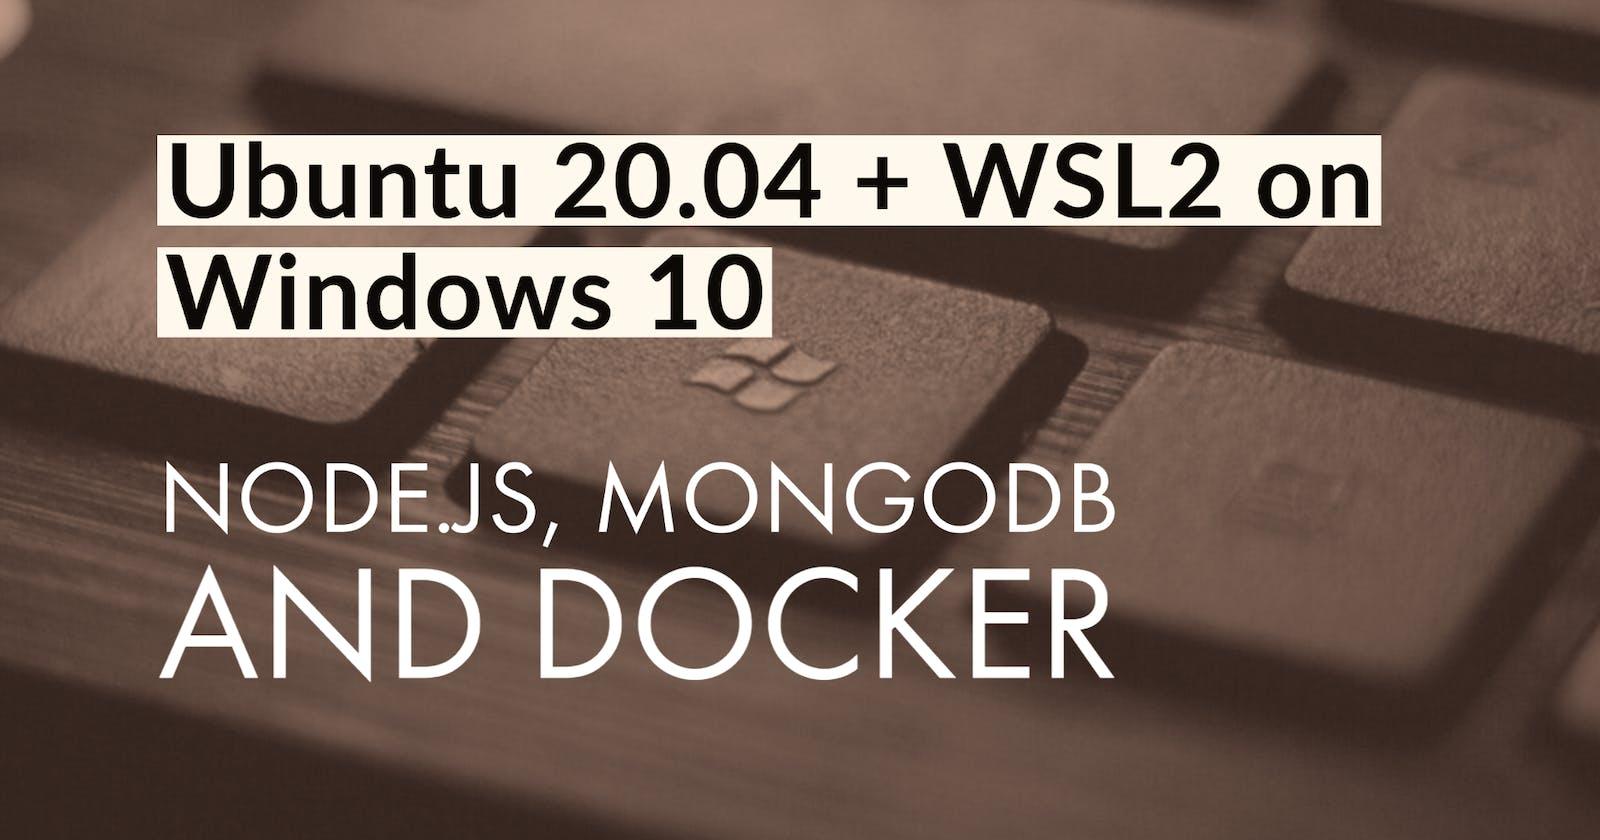 A WSL2 Dev Setup with Ubuntu 20.04, Node.js, MongoDB, VS Code and Docker